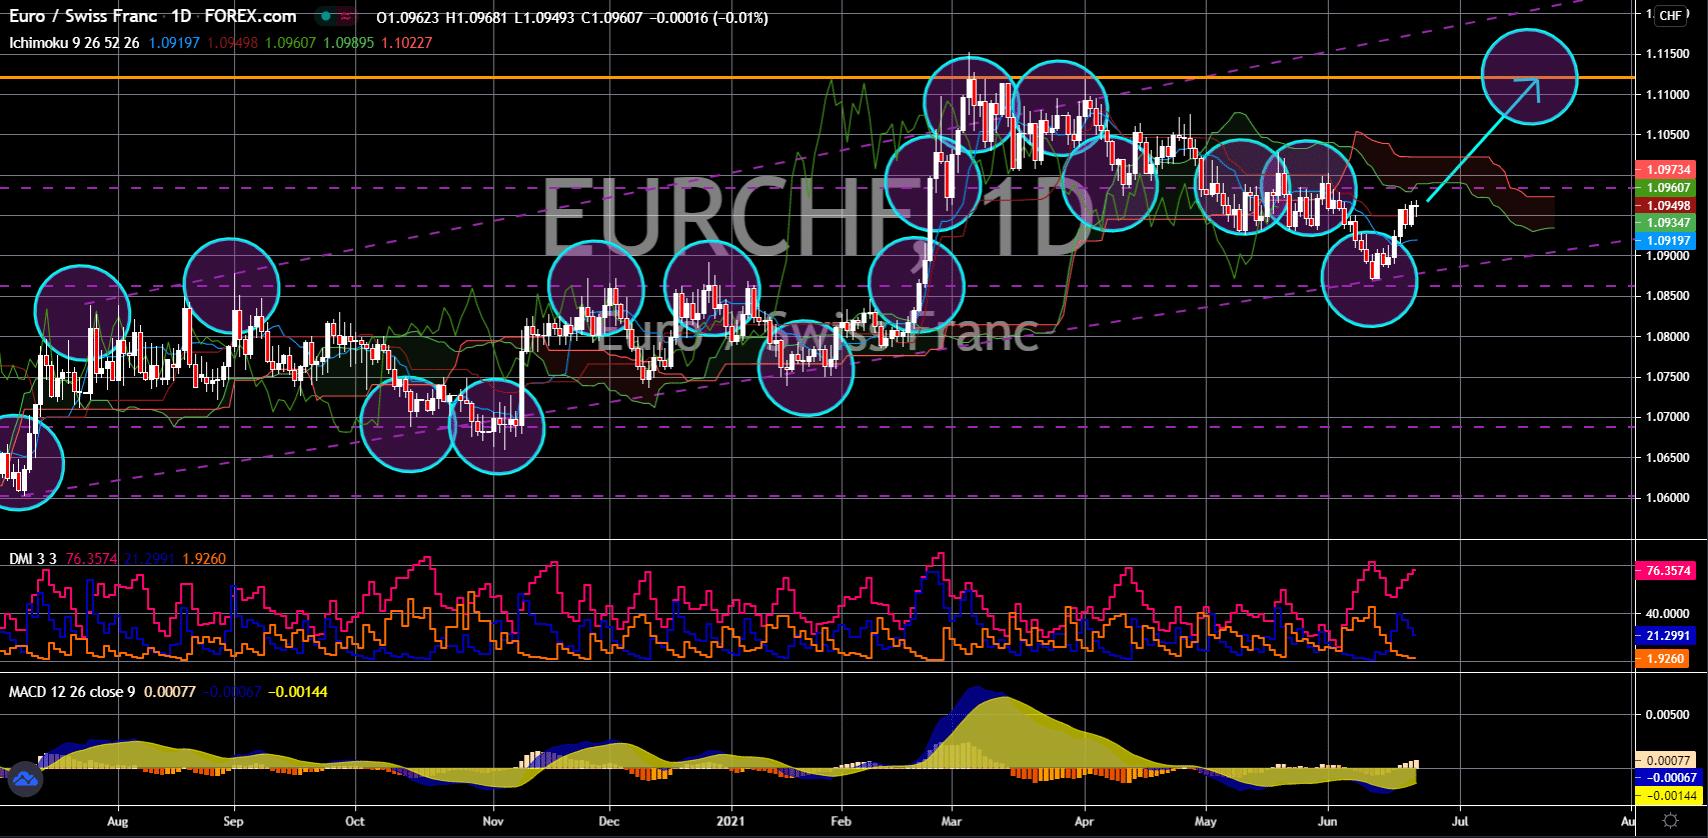 FinanceBrokerage - Notícias do mercado: EUR/CHF Gráfico